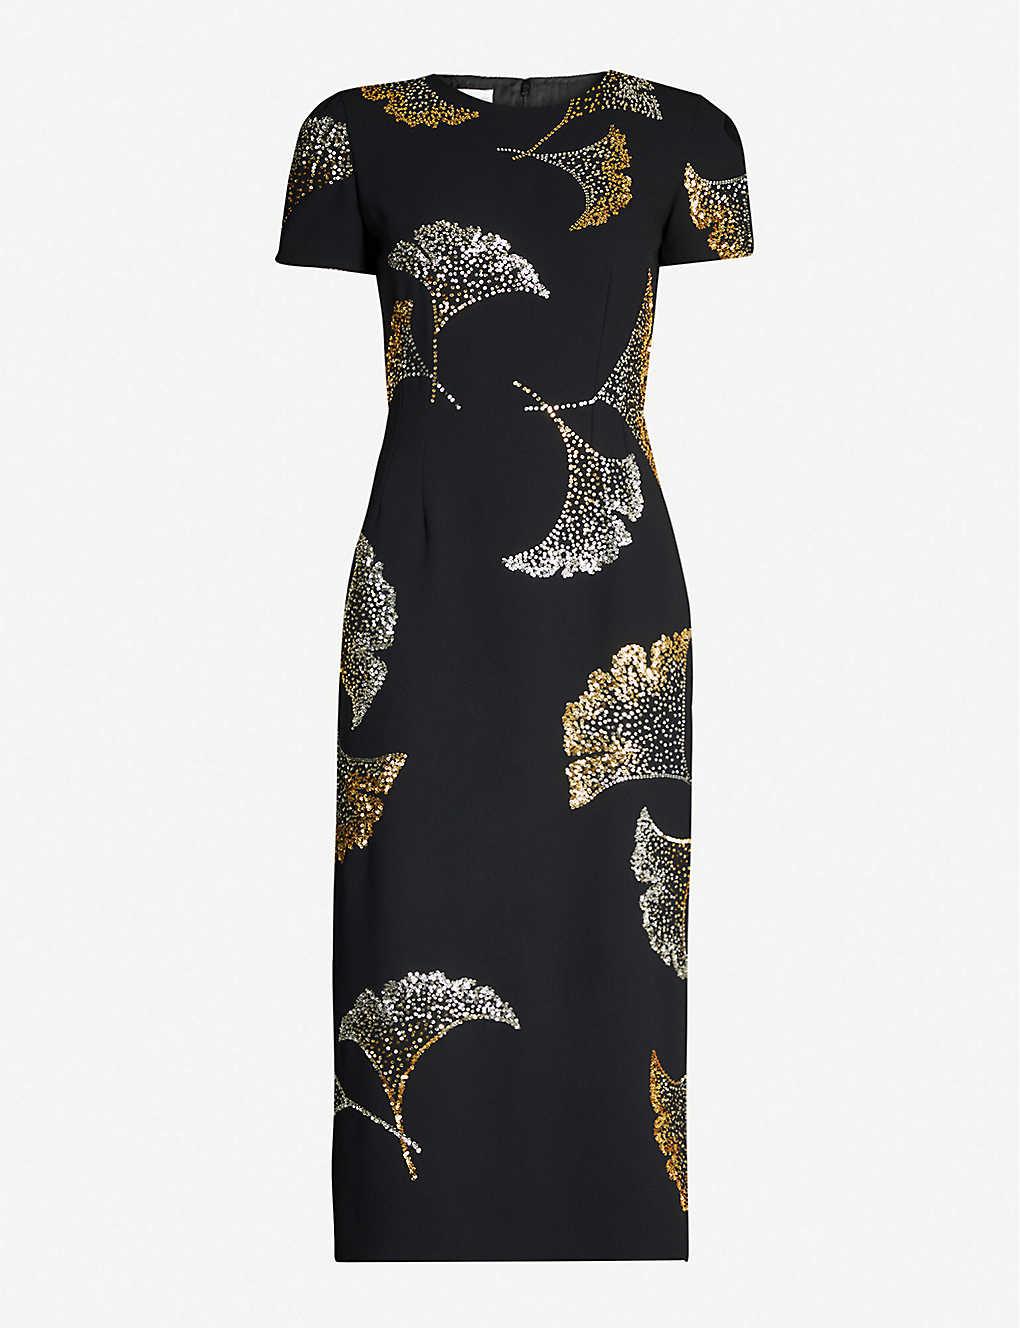 Dries Van Noten Dress Floral-embellished crepe bodycon midi dress